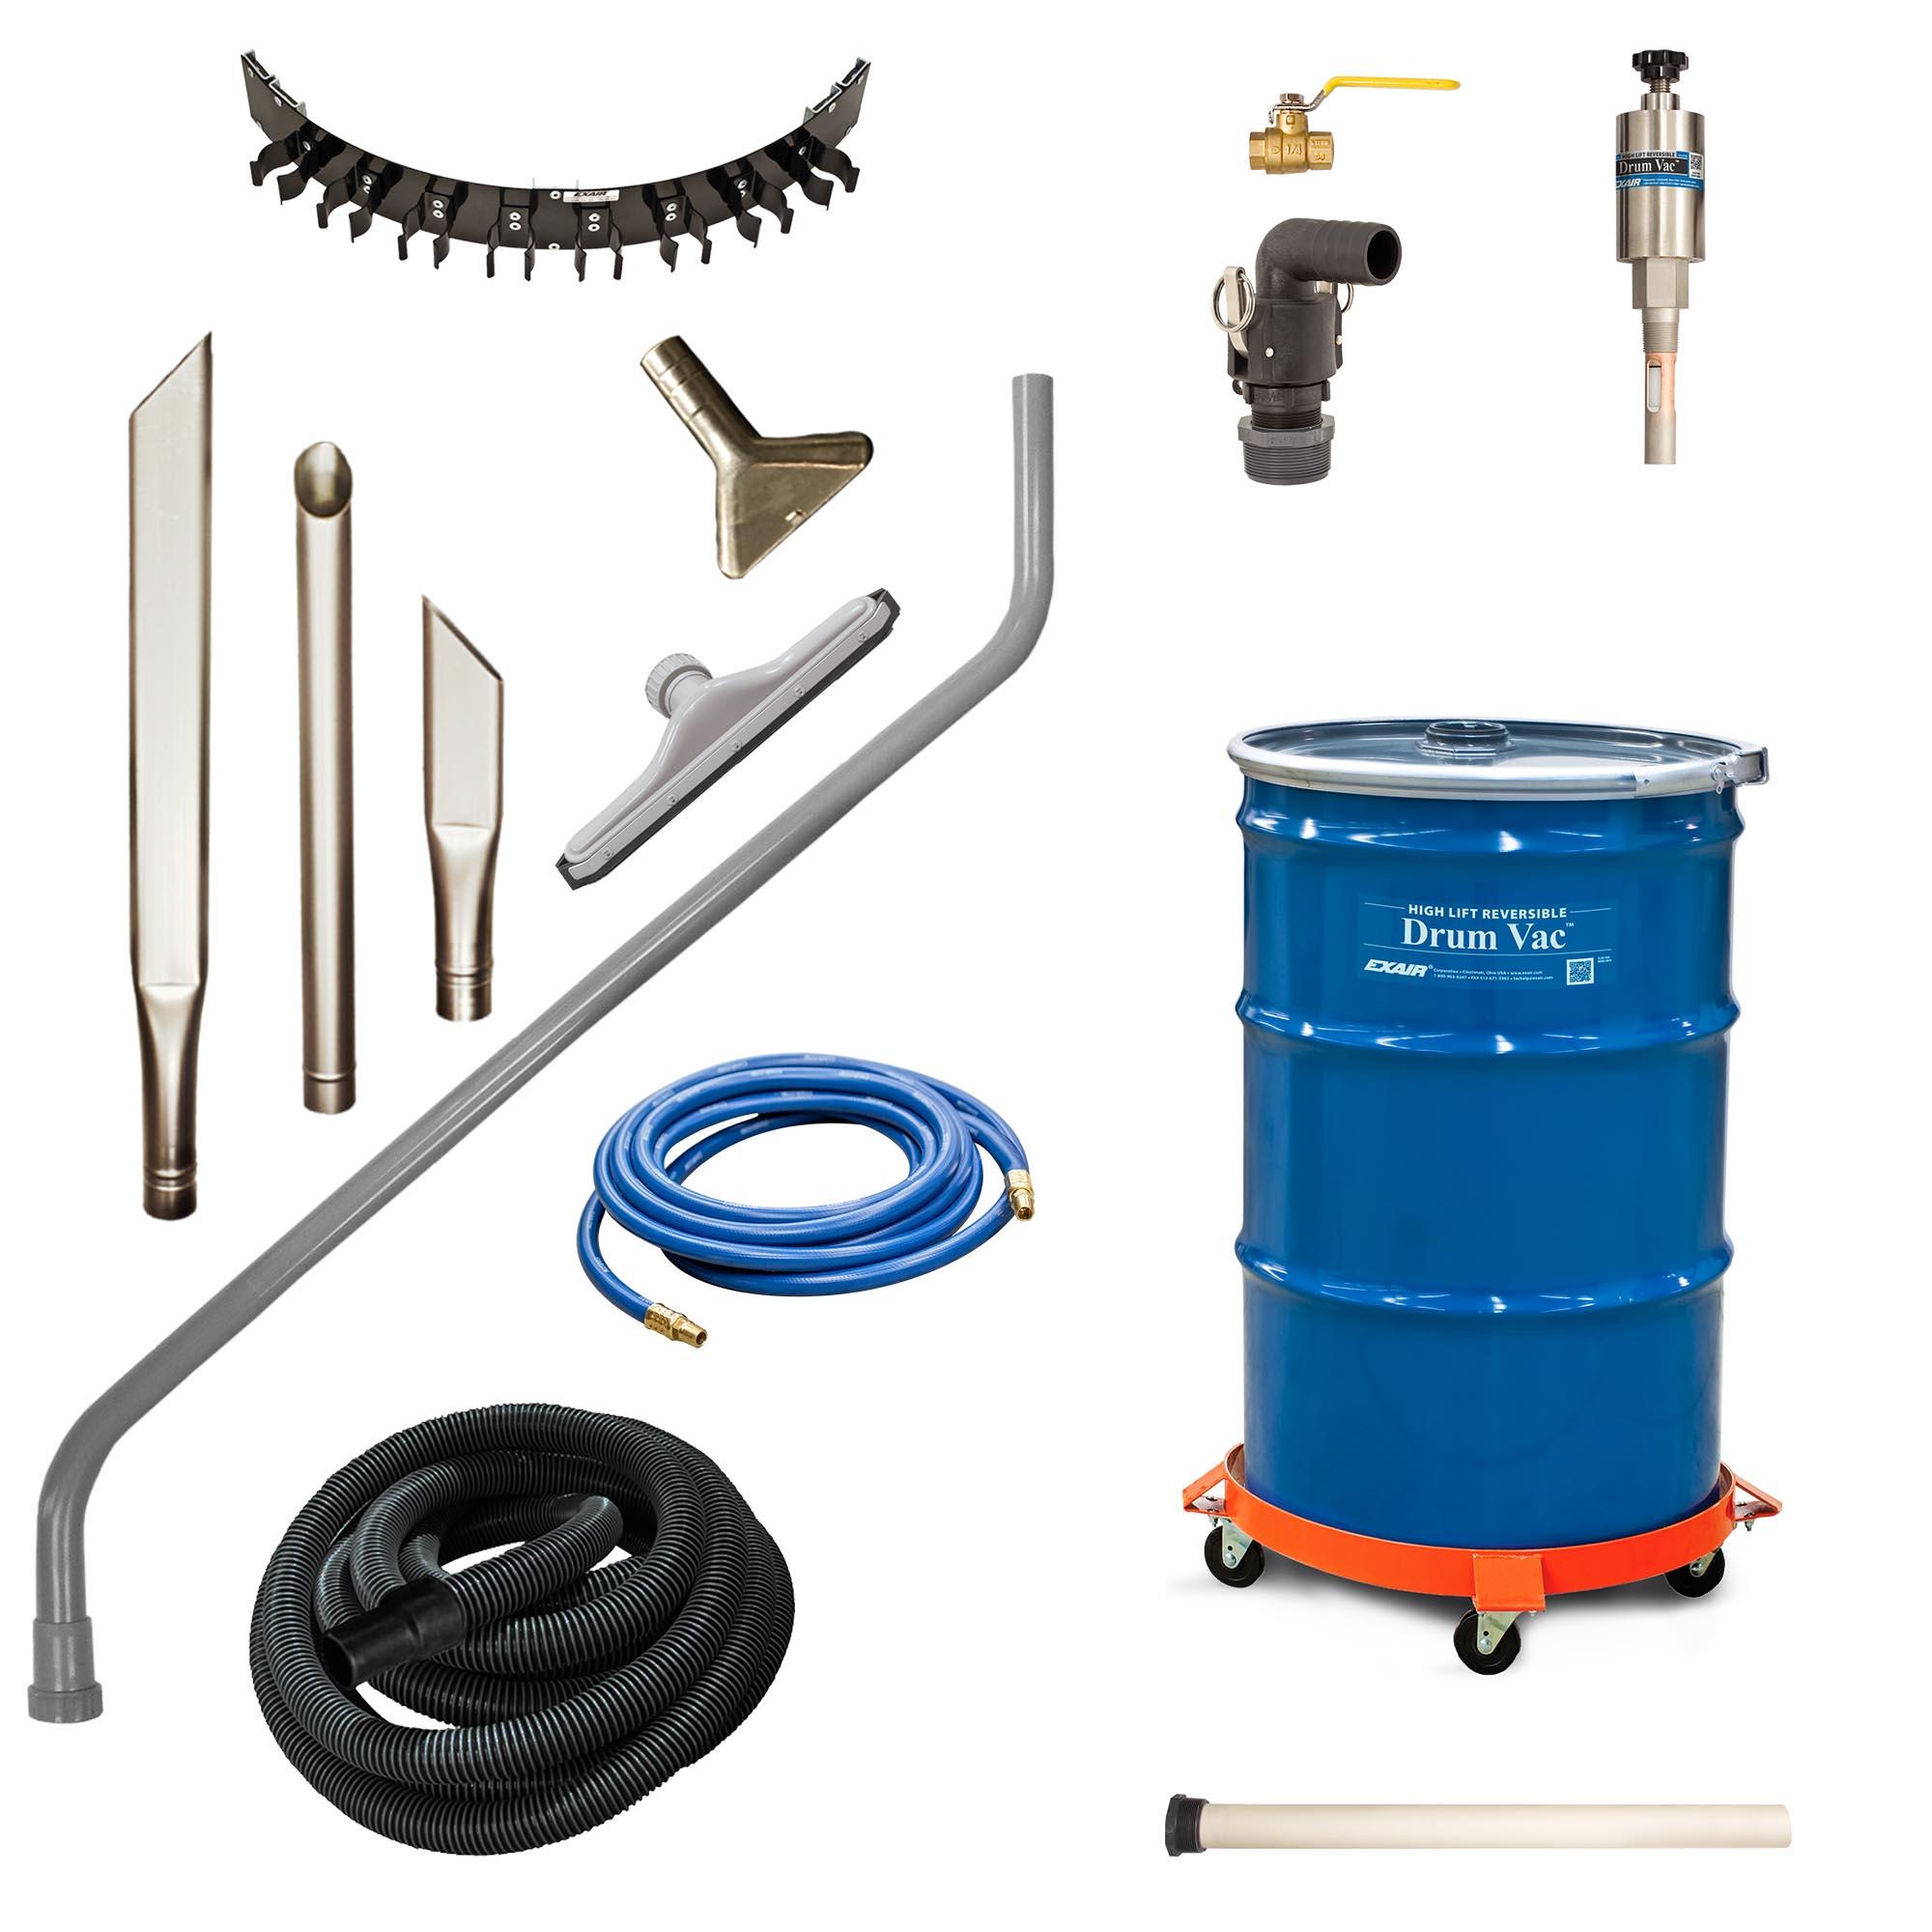 Model 6395-30 30 Gallon High Lift Premium Reversible Drum Vac System